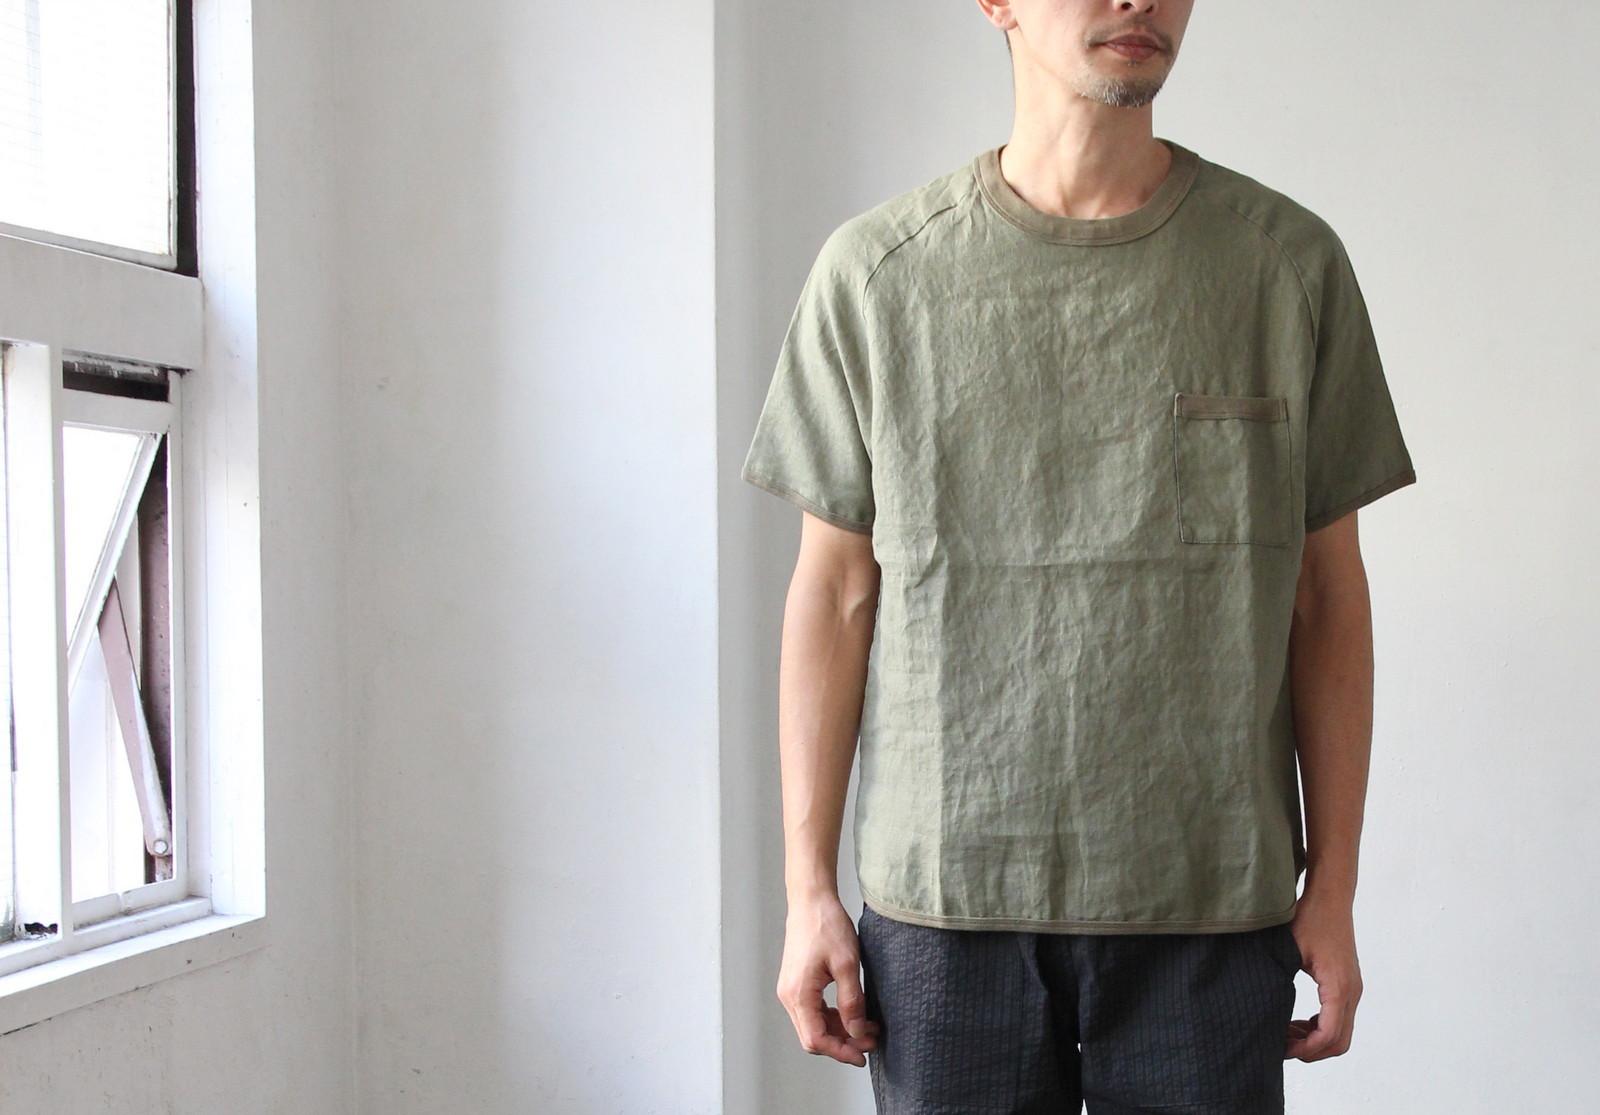 French Linen T-shirt_c0379477_05412017.jpg